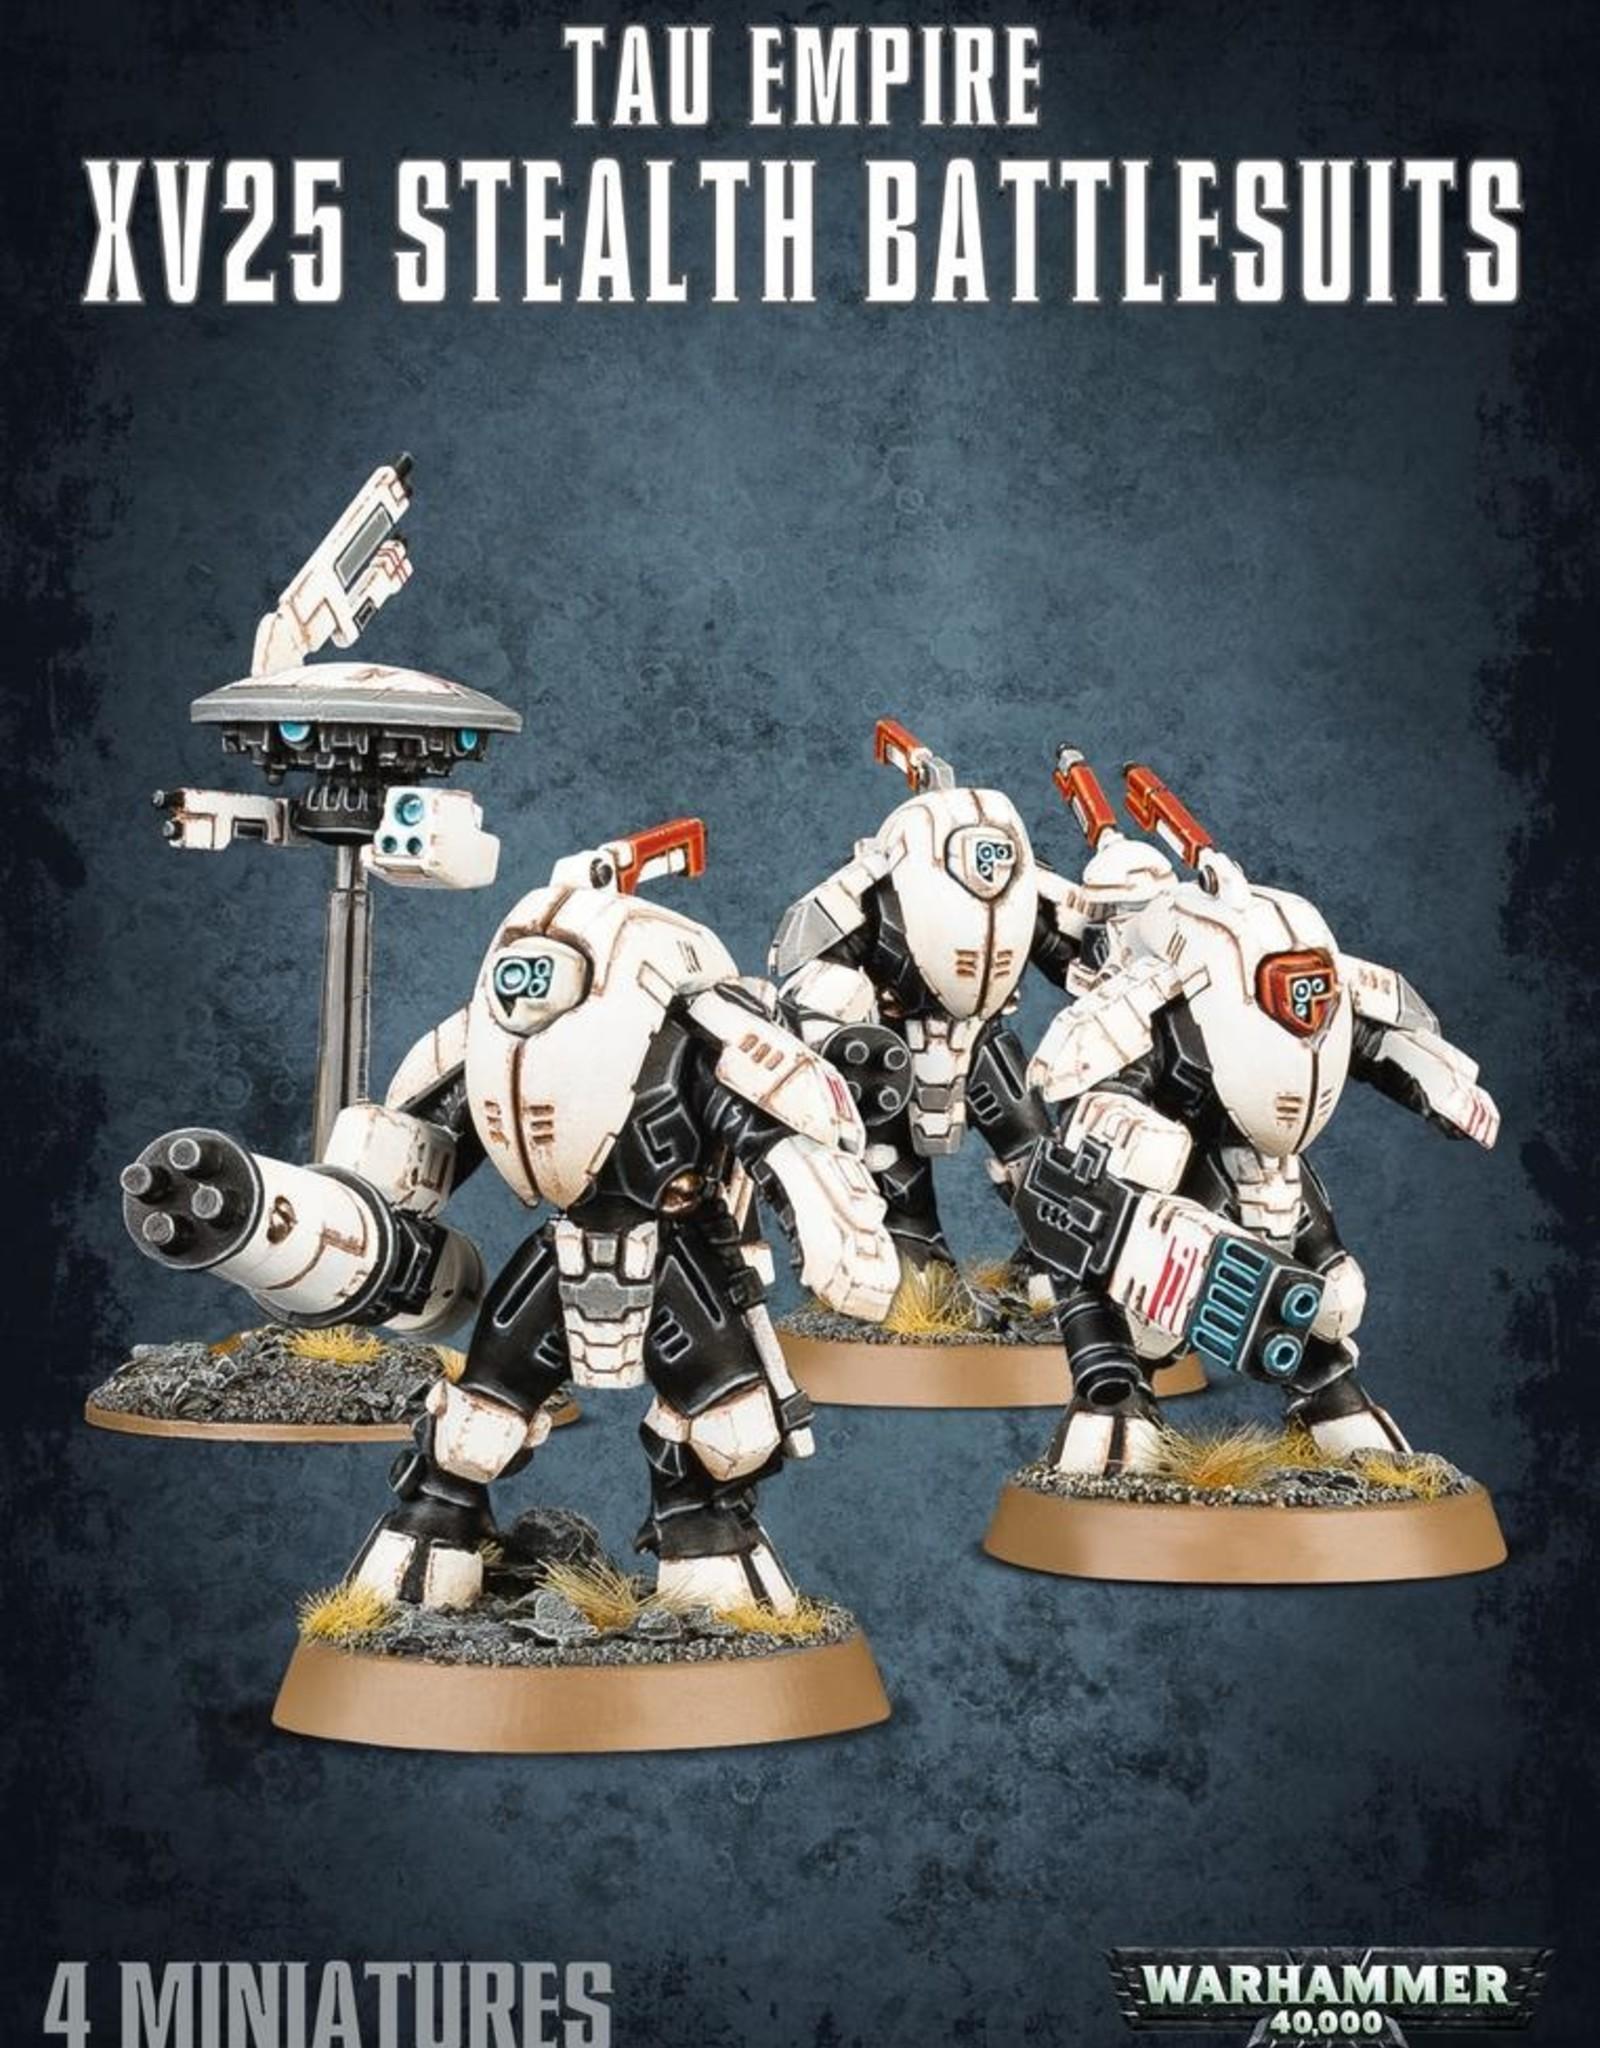 T'au Empire XV25 Stealth Battlesuits